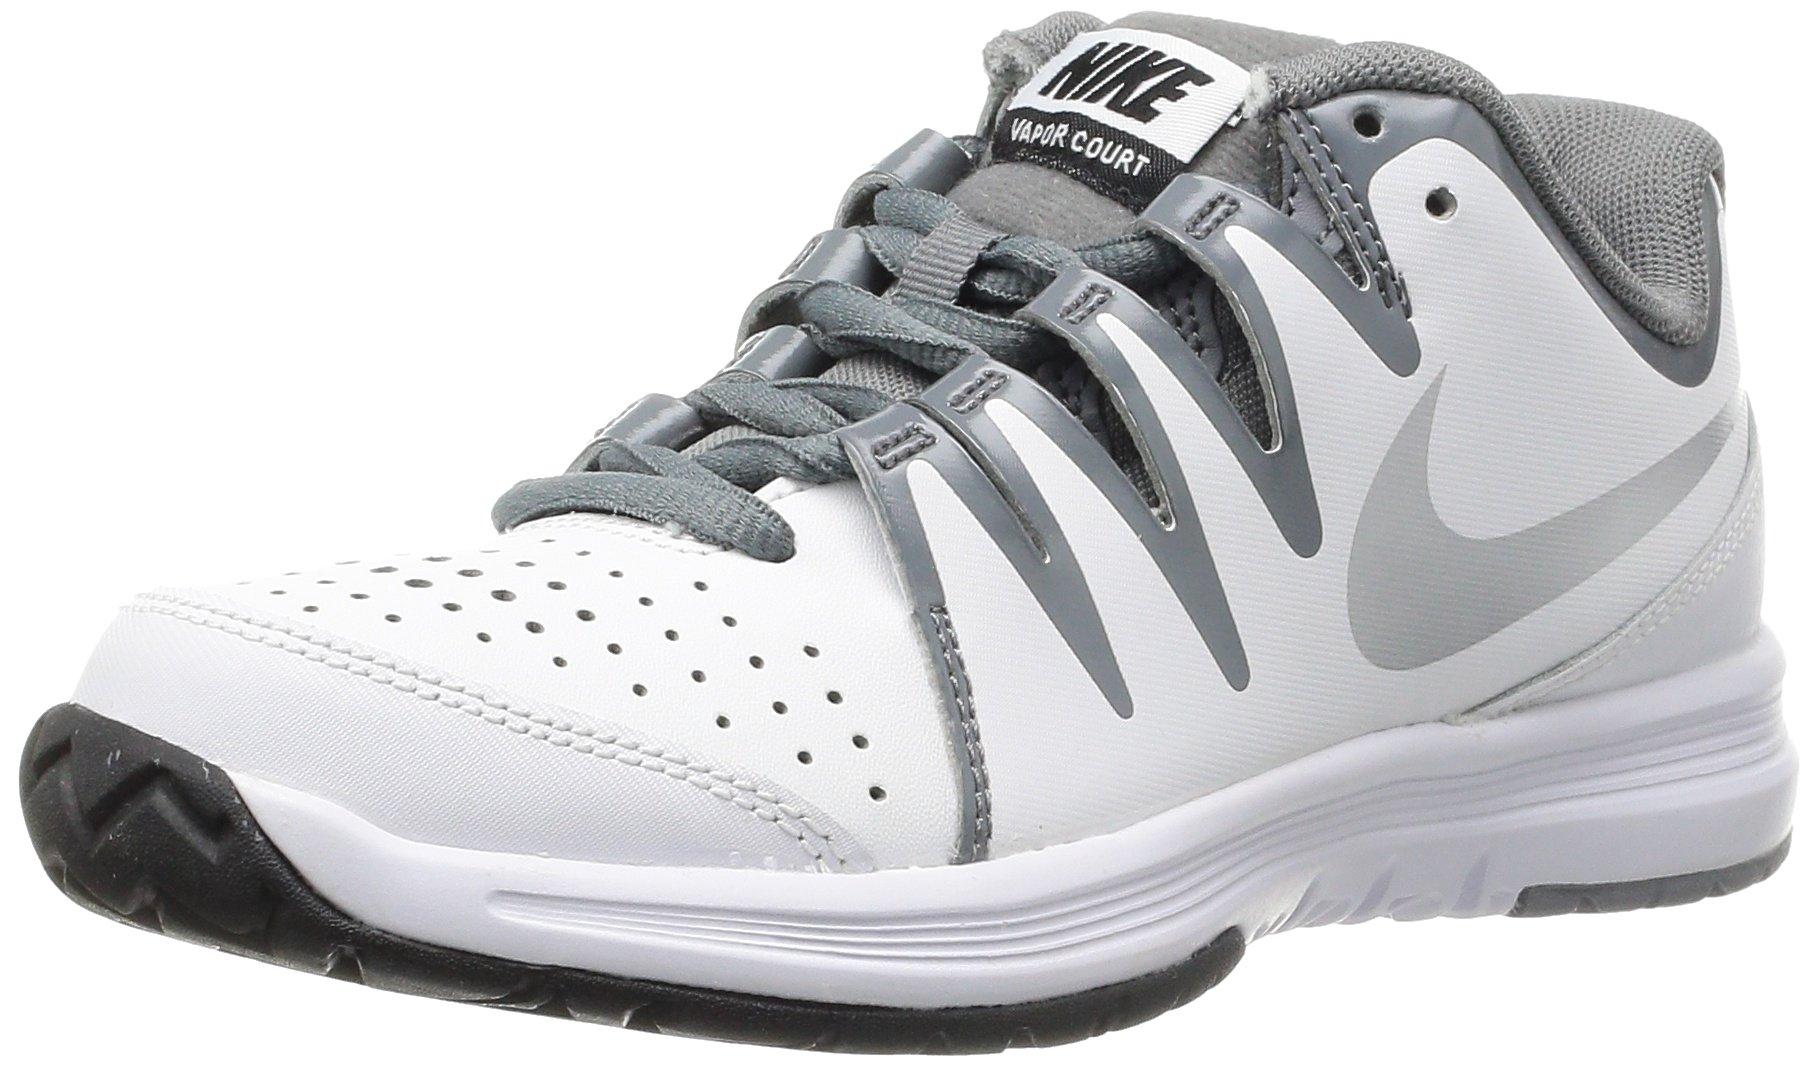 nike vapor court womens tennis shoes 631713 sneakers trainers (US 10.5, white metallic silver 100)